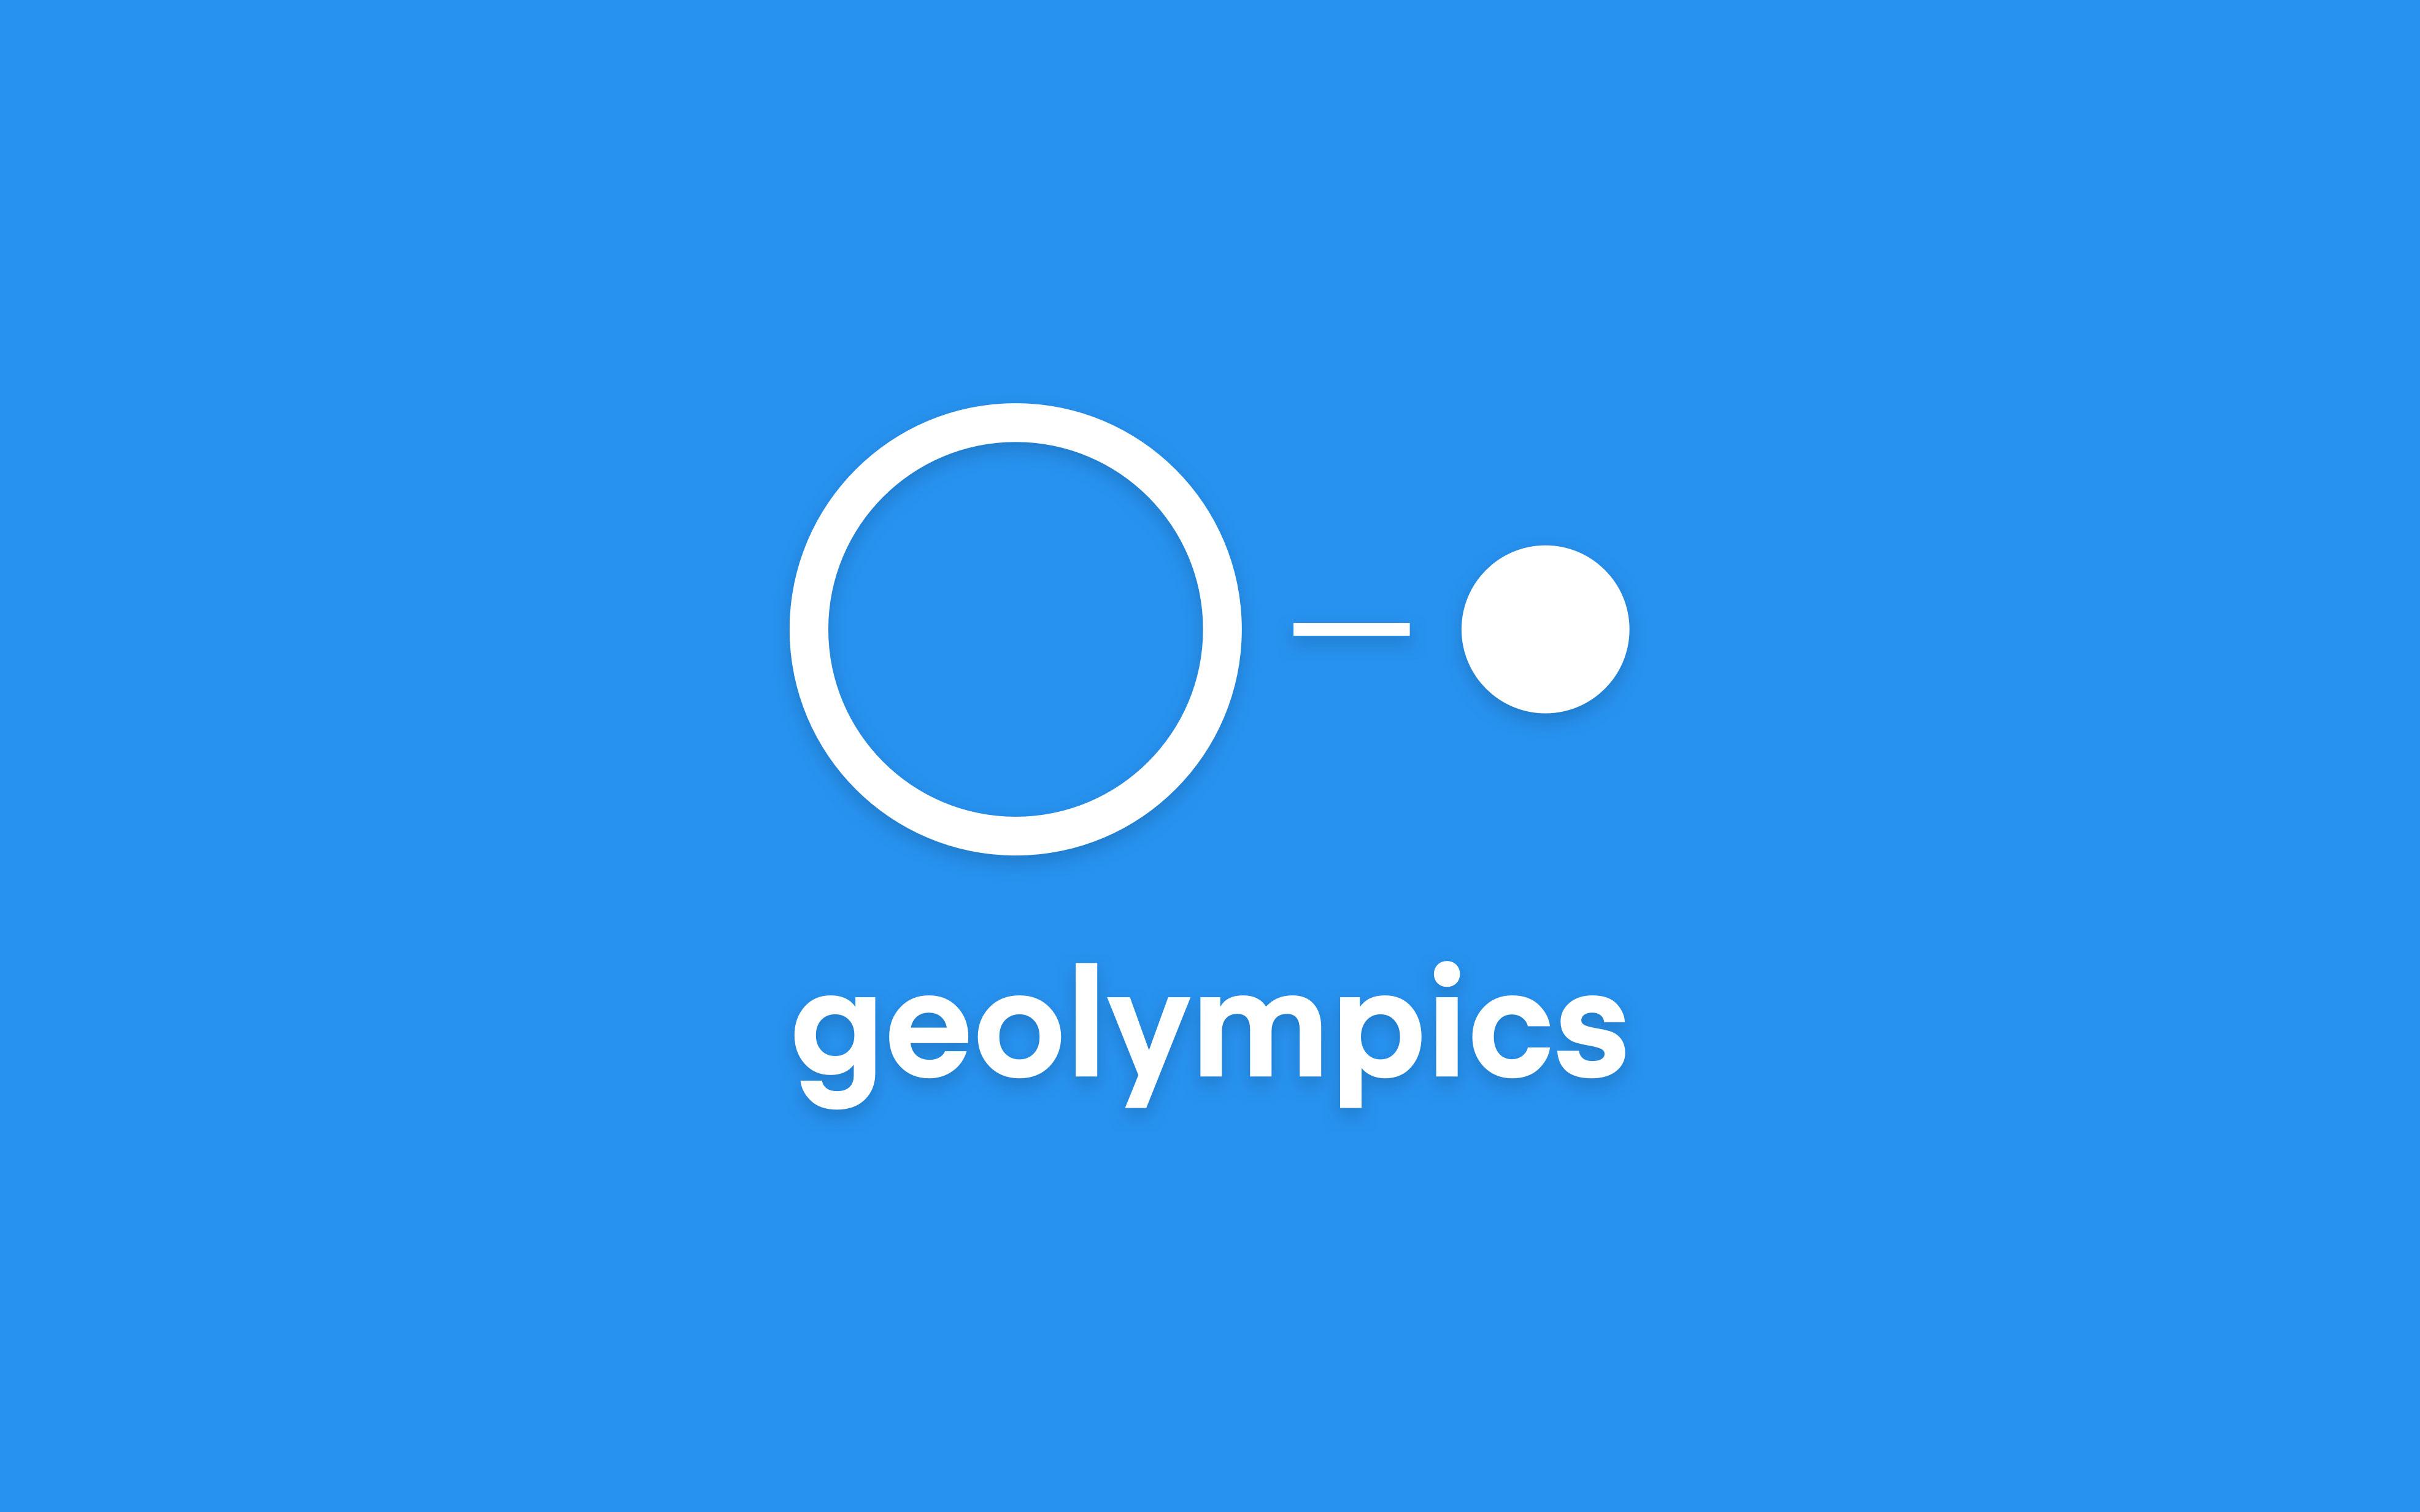 Logo of Geolympics